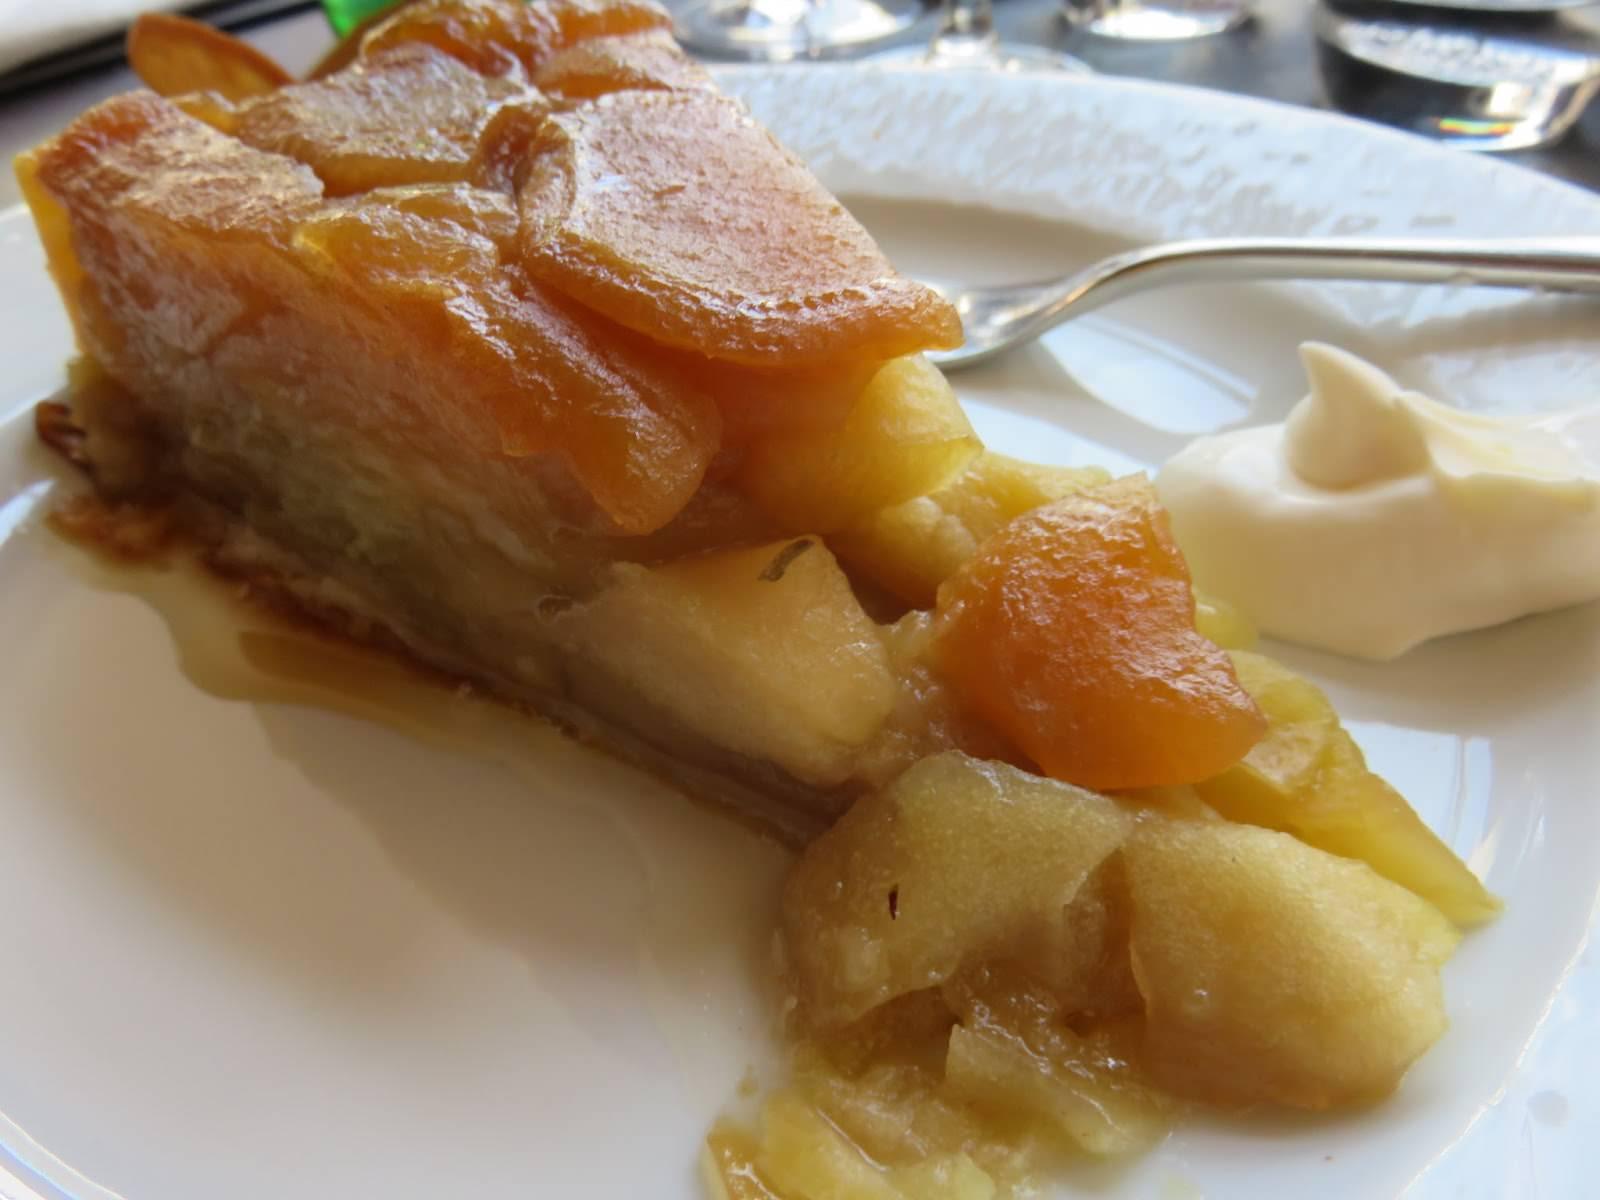 Tarte tatin with creme fraiche (sour cream)